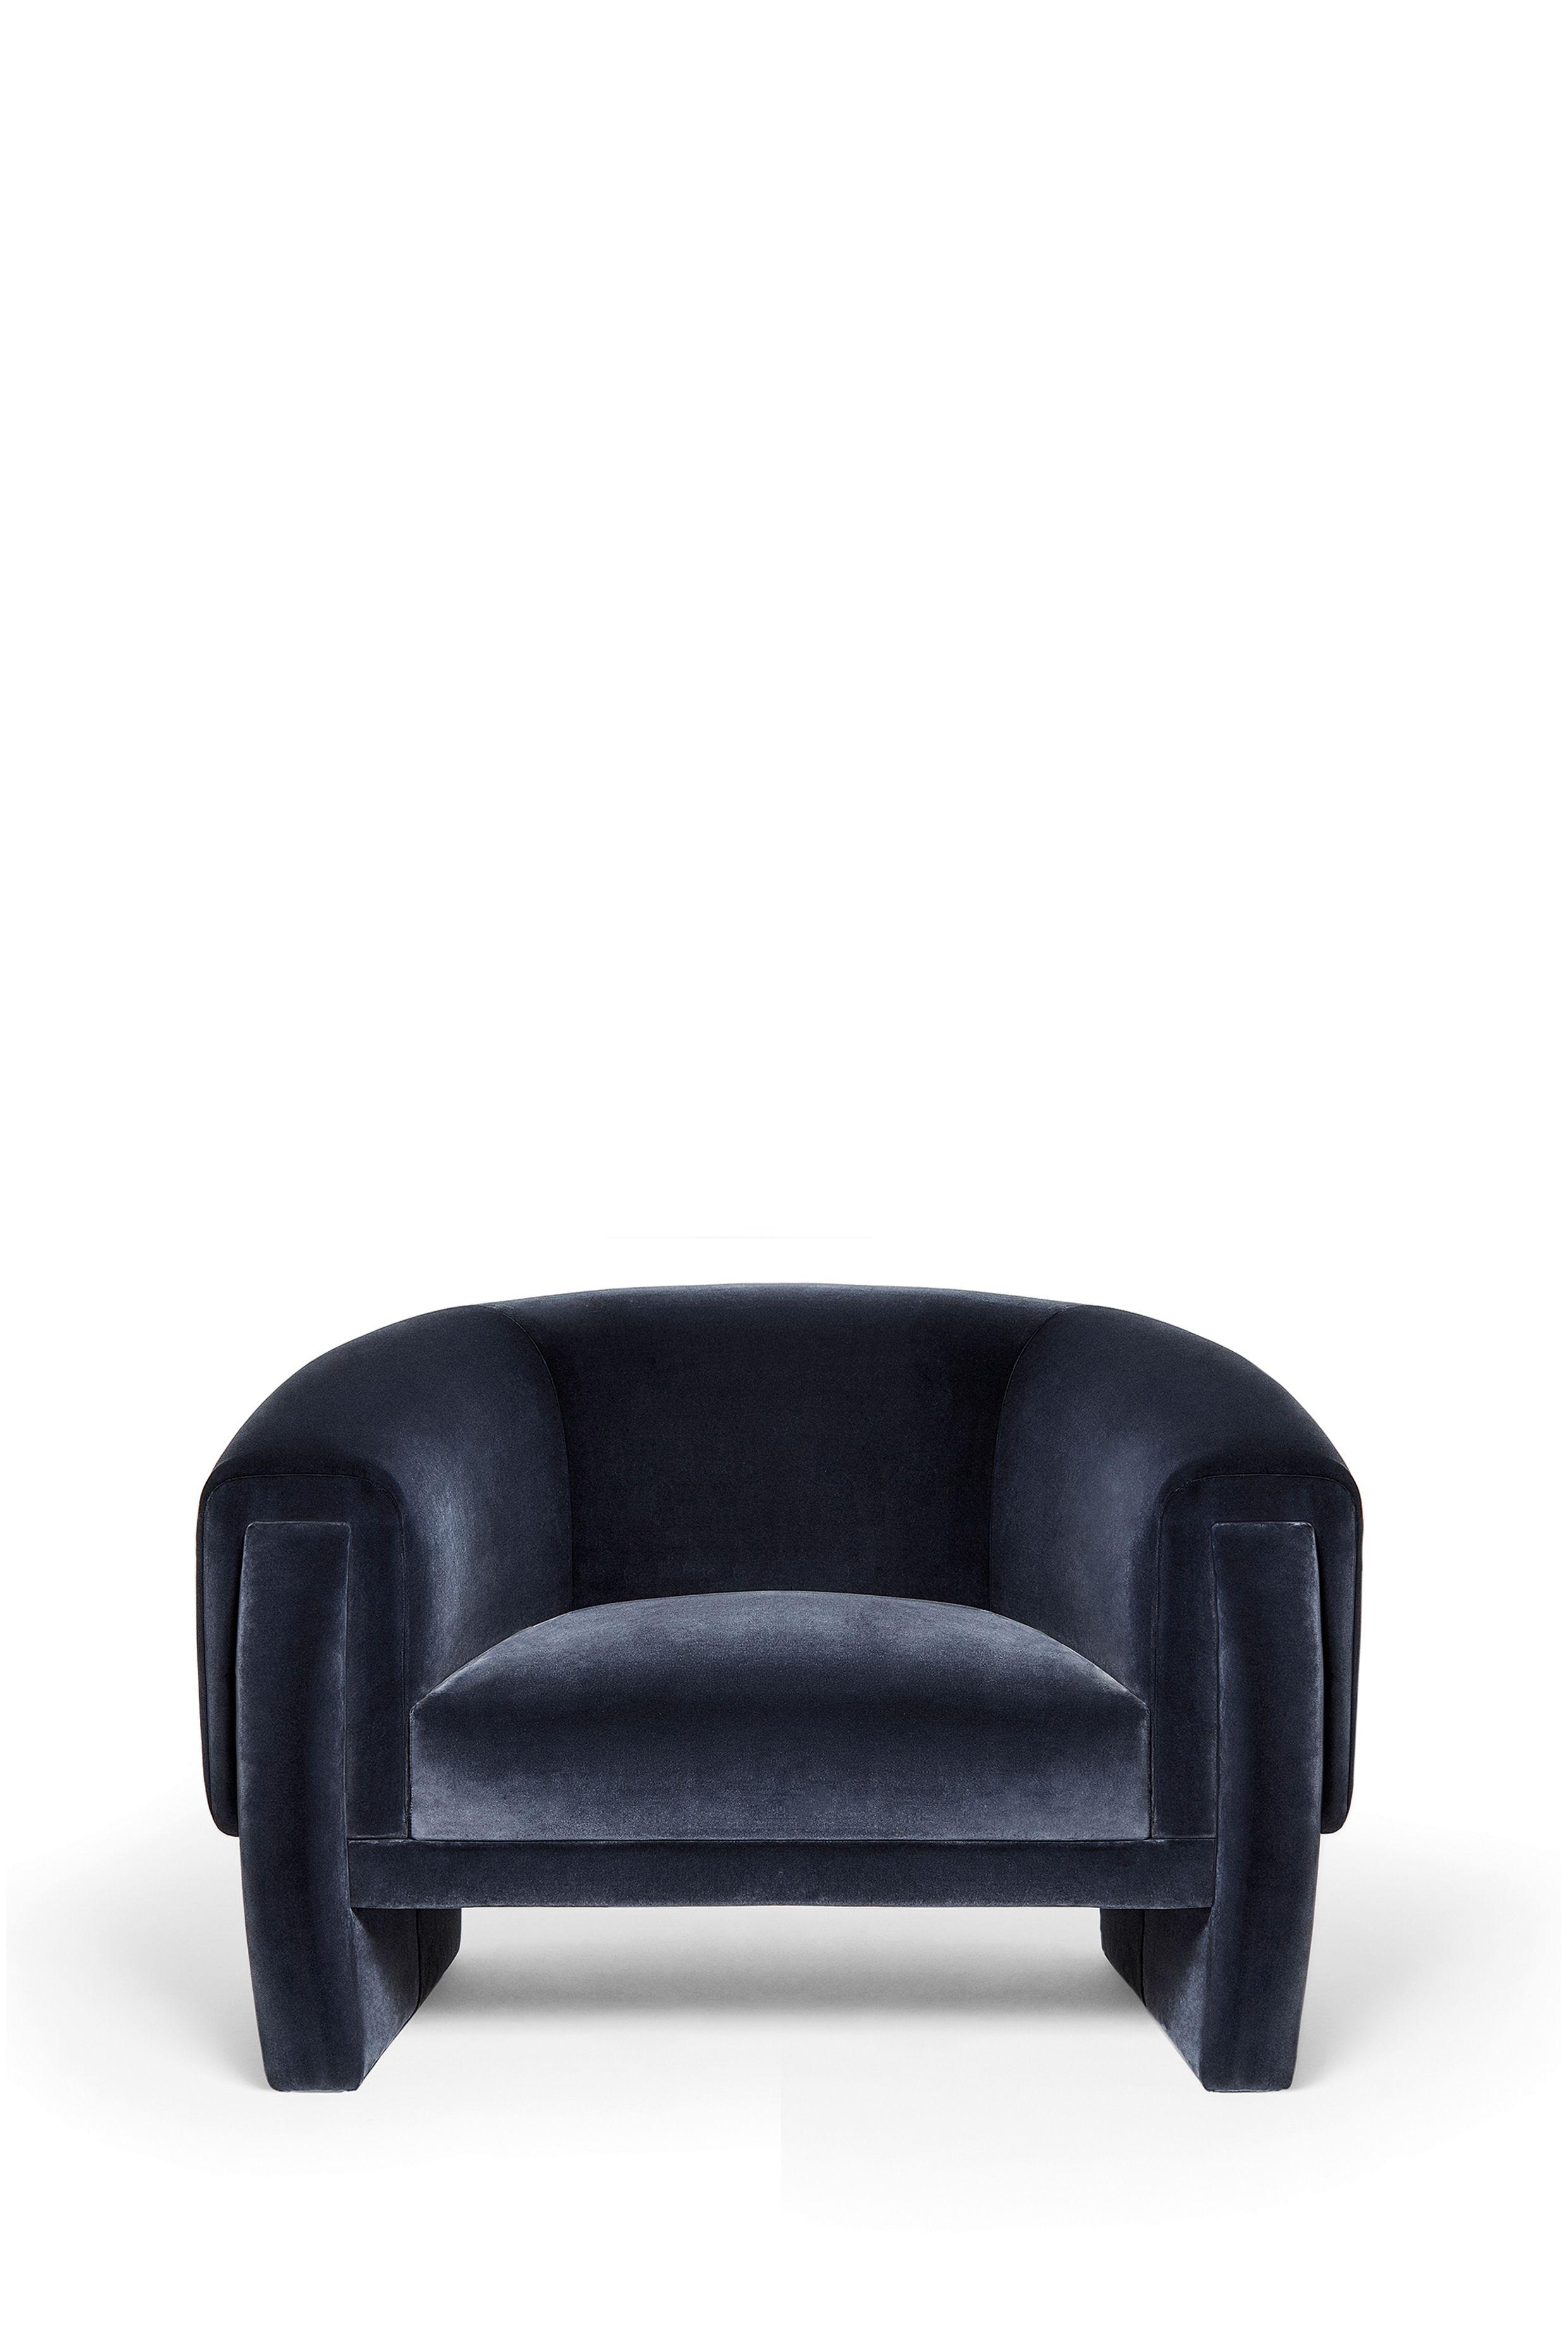 Luke Single Seat Sofa Armchair Sofa Design